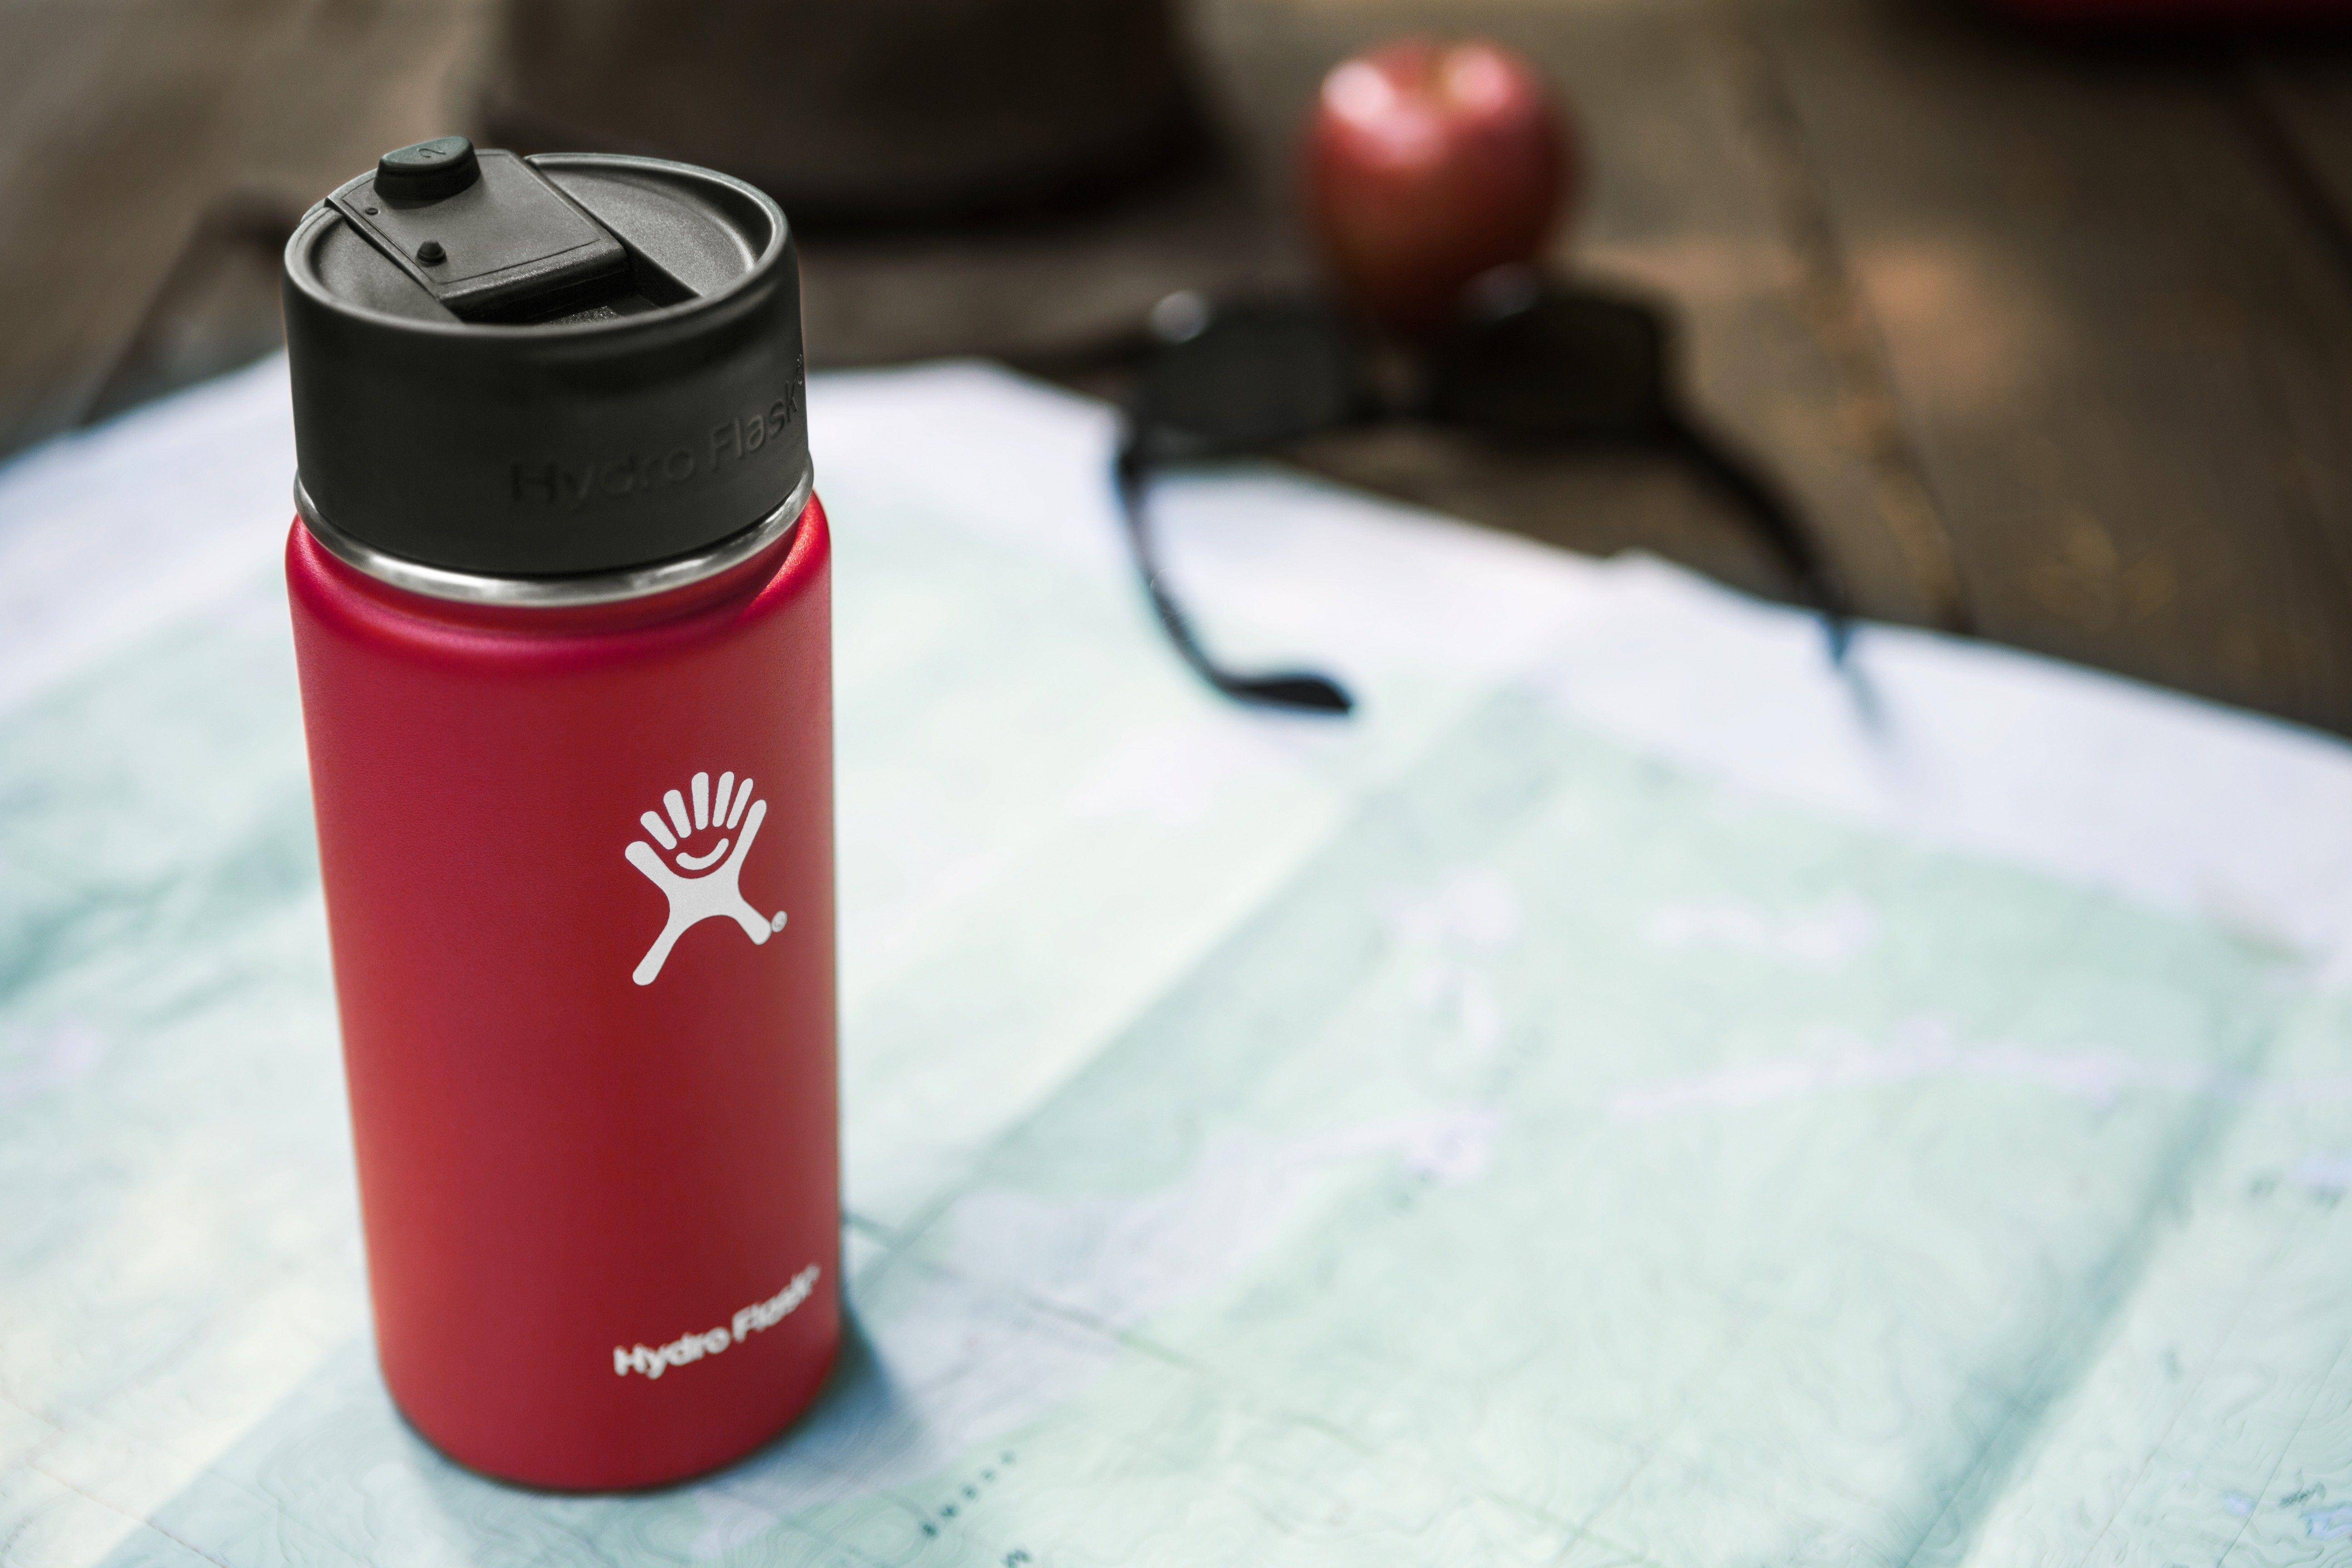 0506588dea9 16 oz. Wide Mouth Insulated Coffee Mug | Hydro Flask | my dream ...